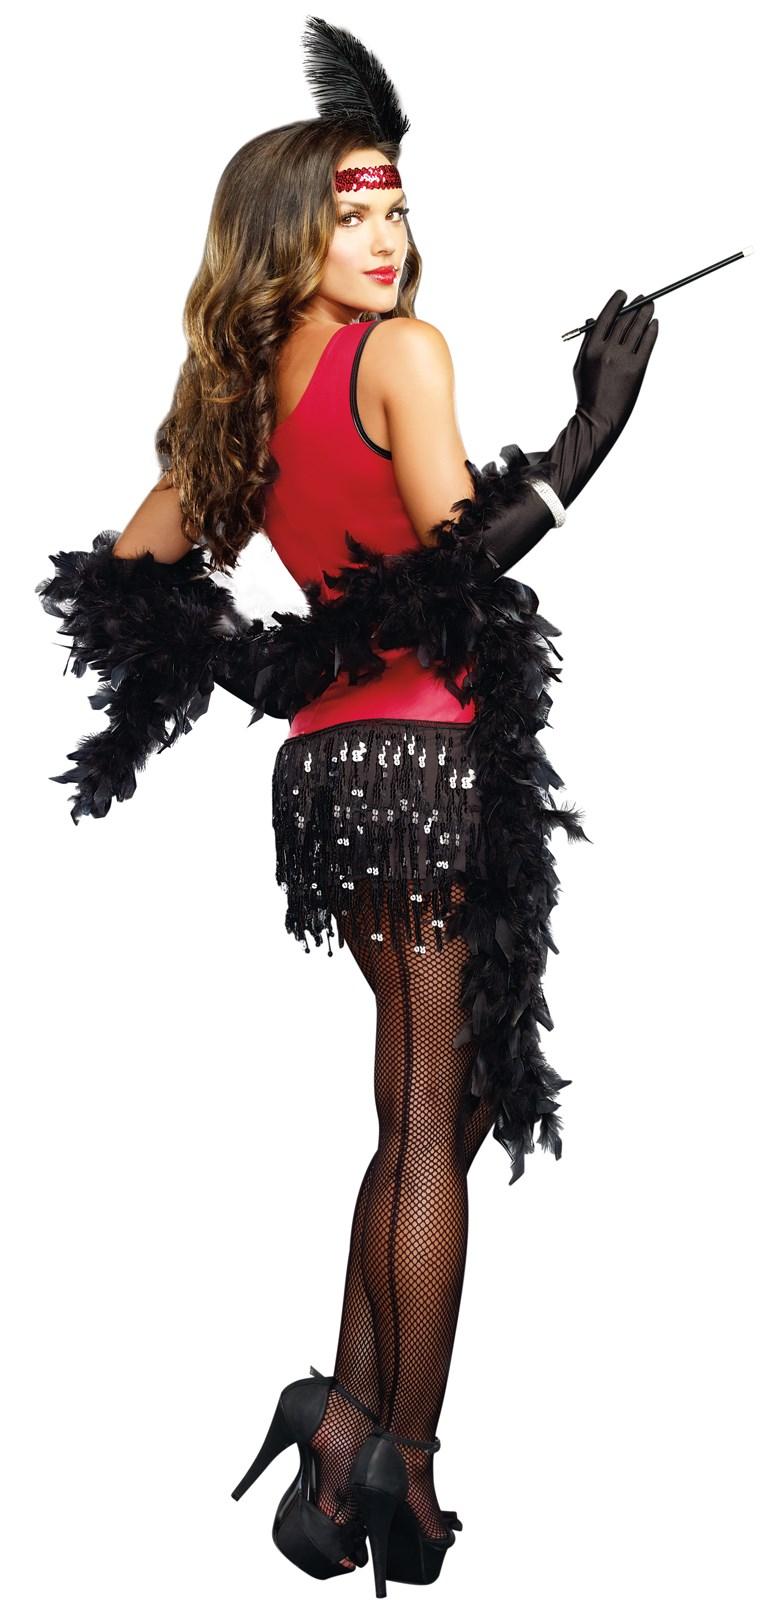 Where can i buy a flapper dress